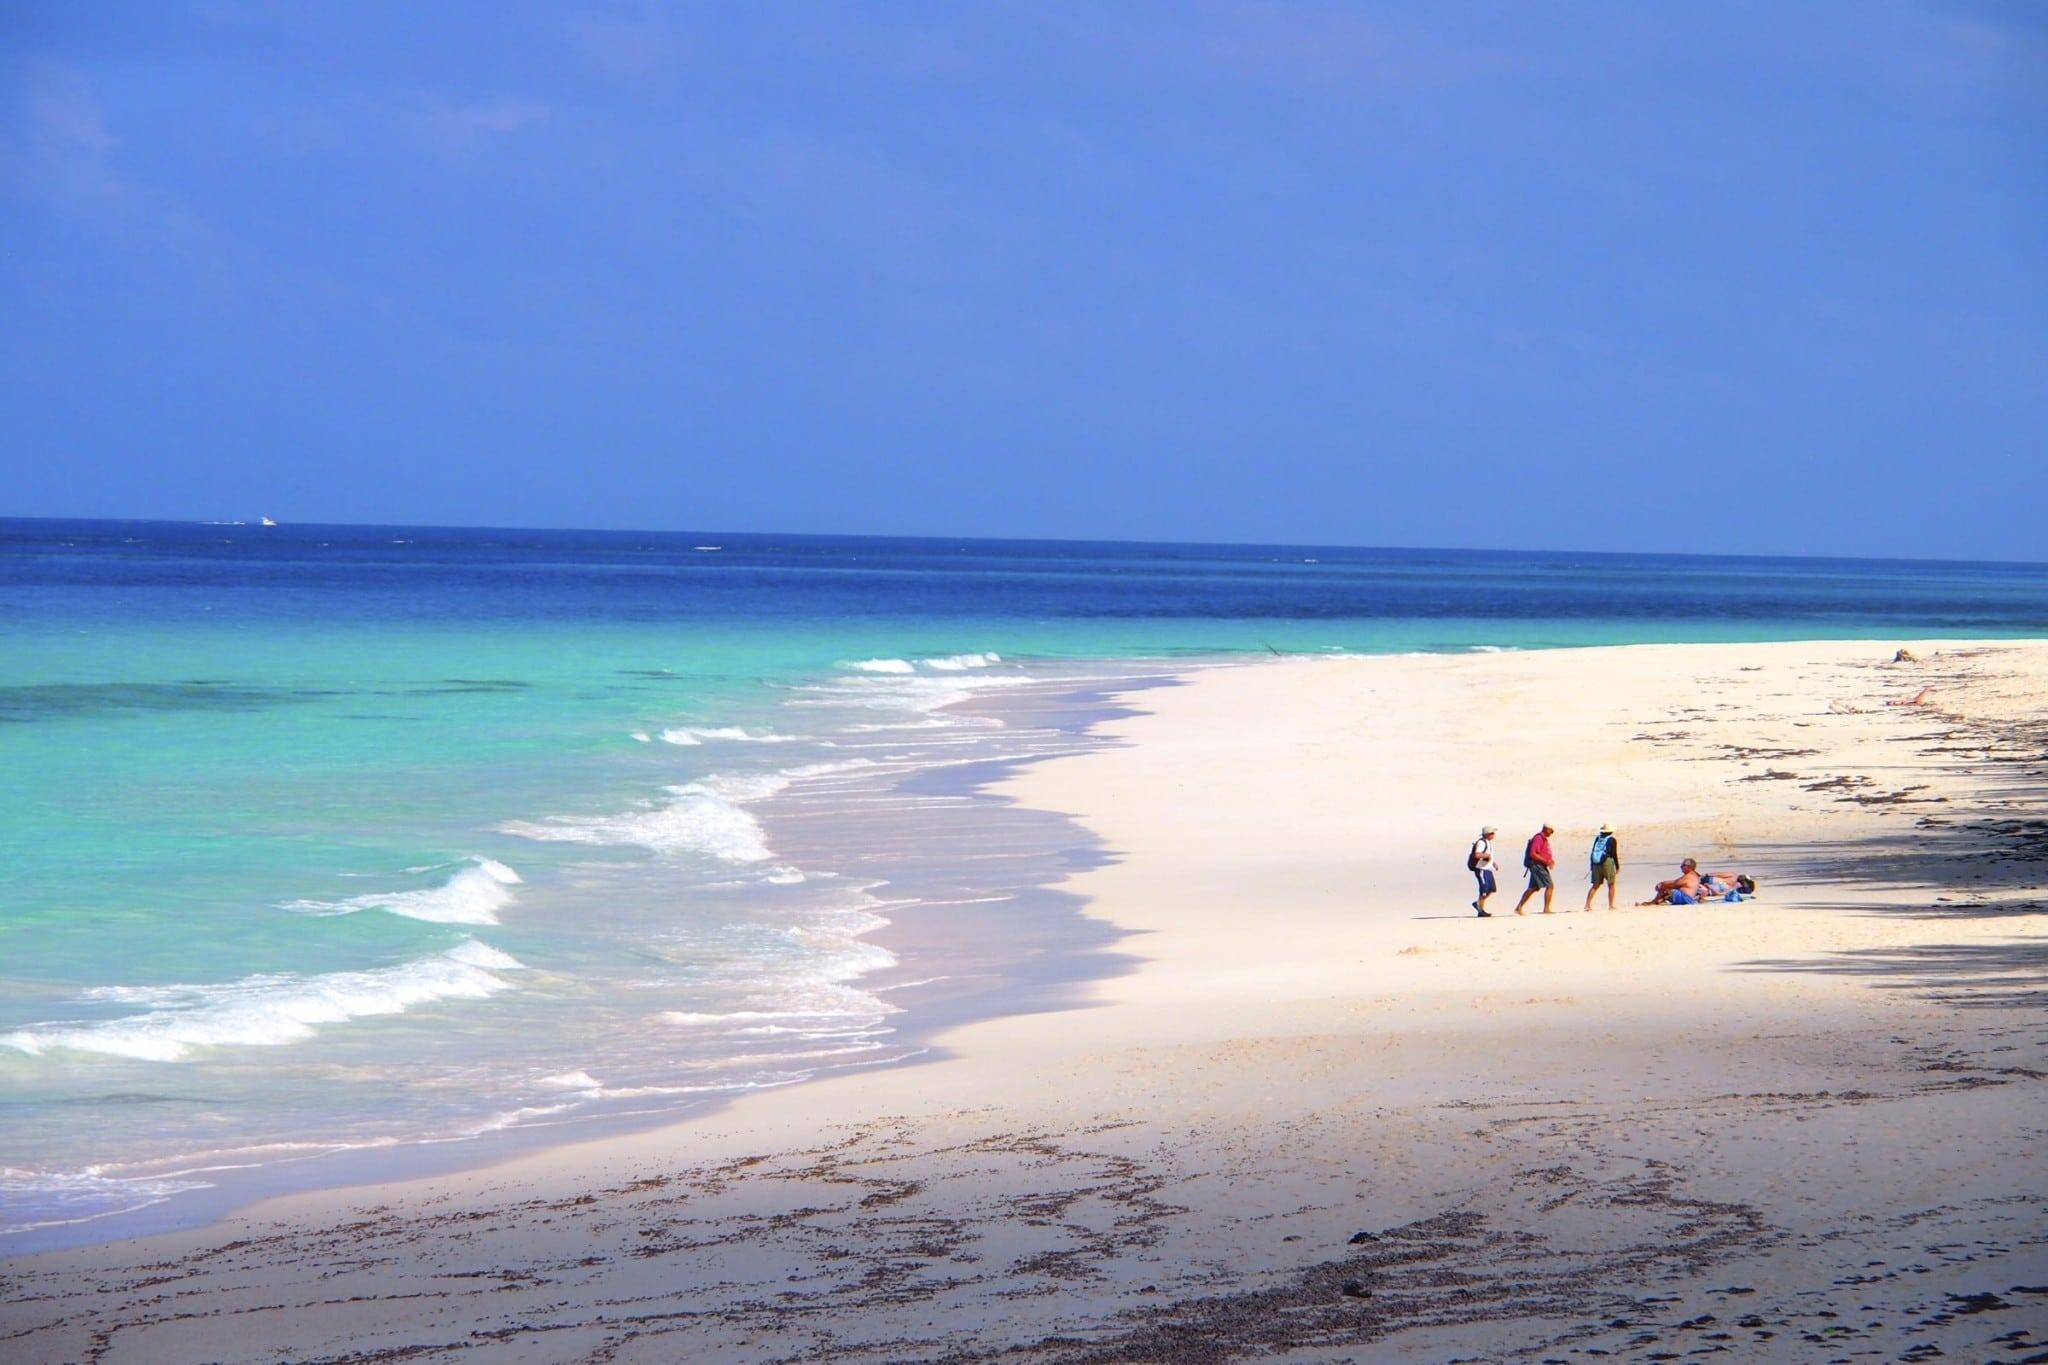 Exploring The Leeward Shores of Great Guana Cay, The Bahamas: Wish You Were Here